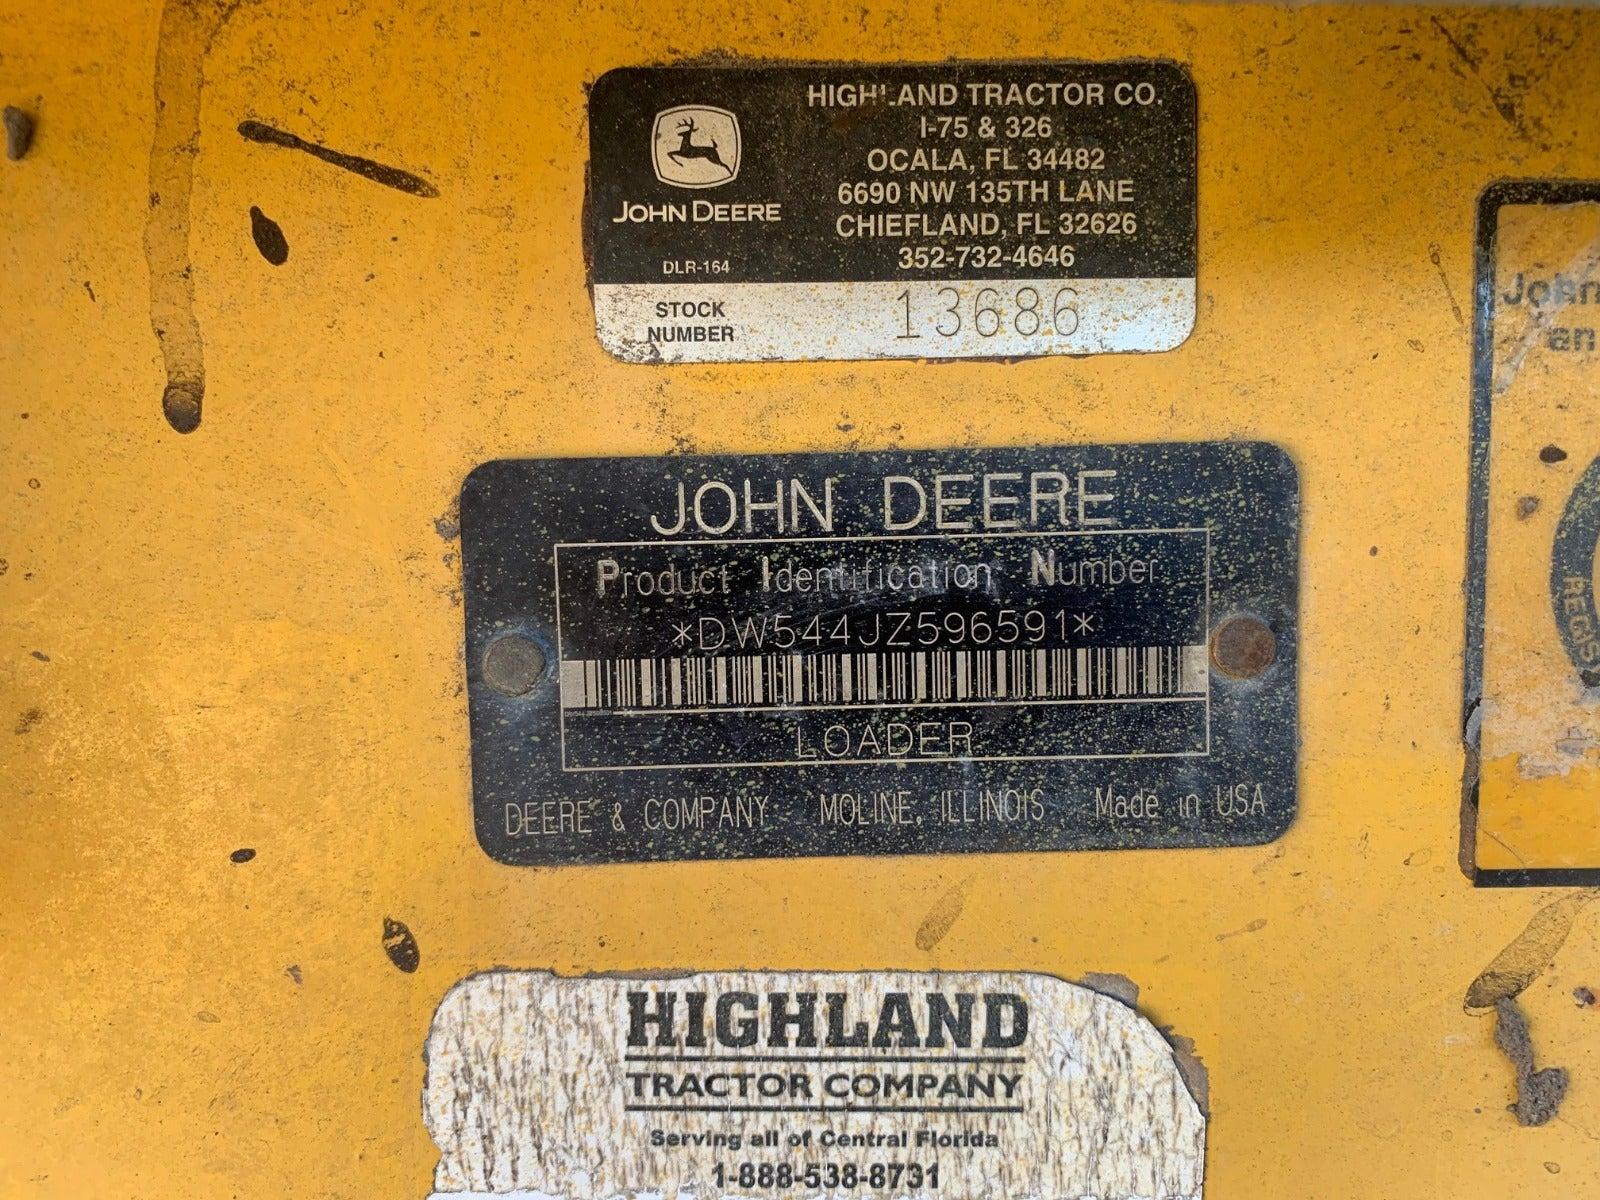 John Deere 544J dismantled machine photo 13